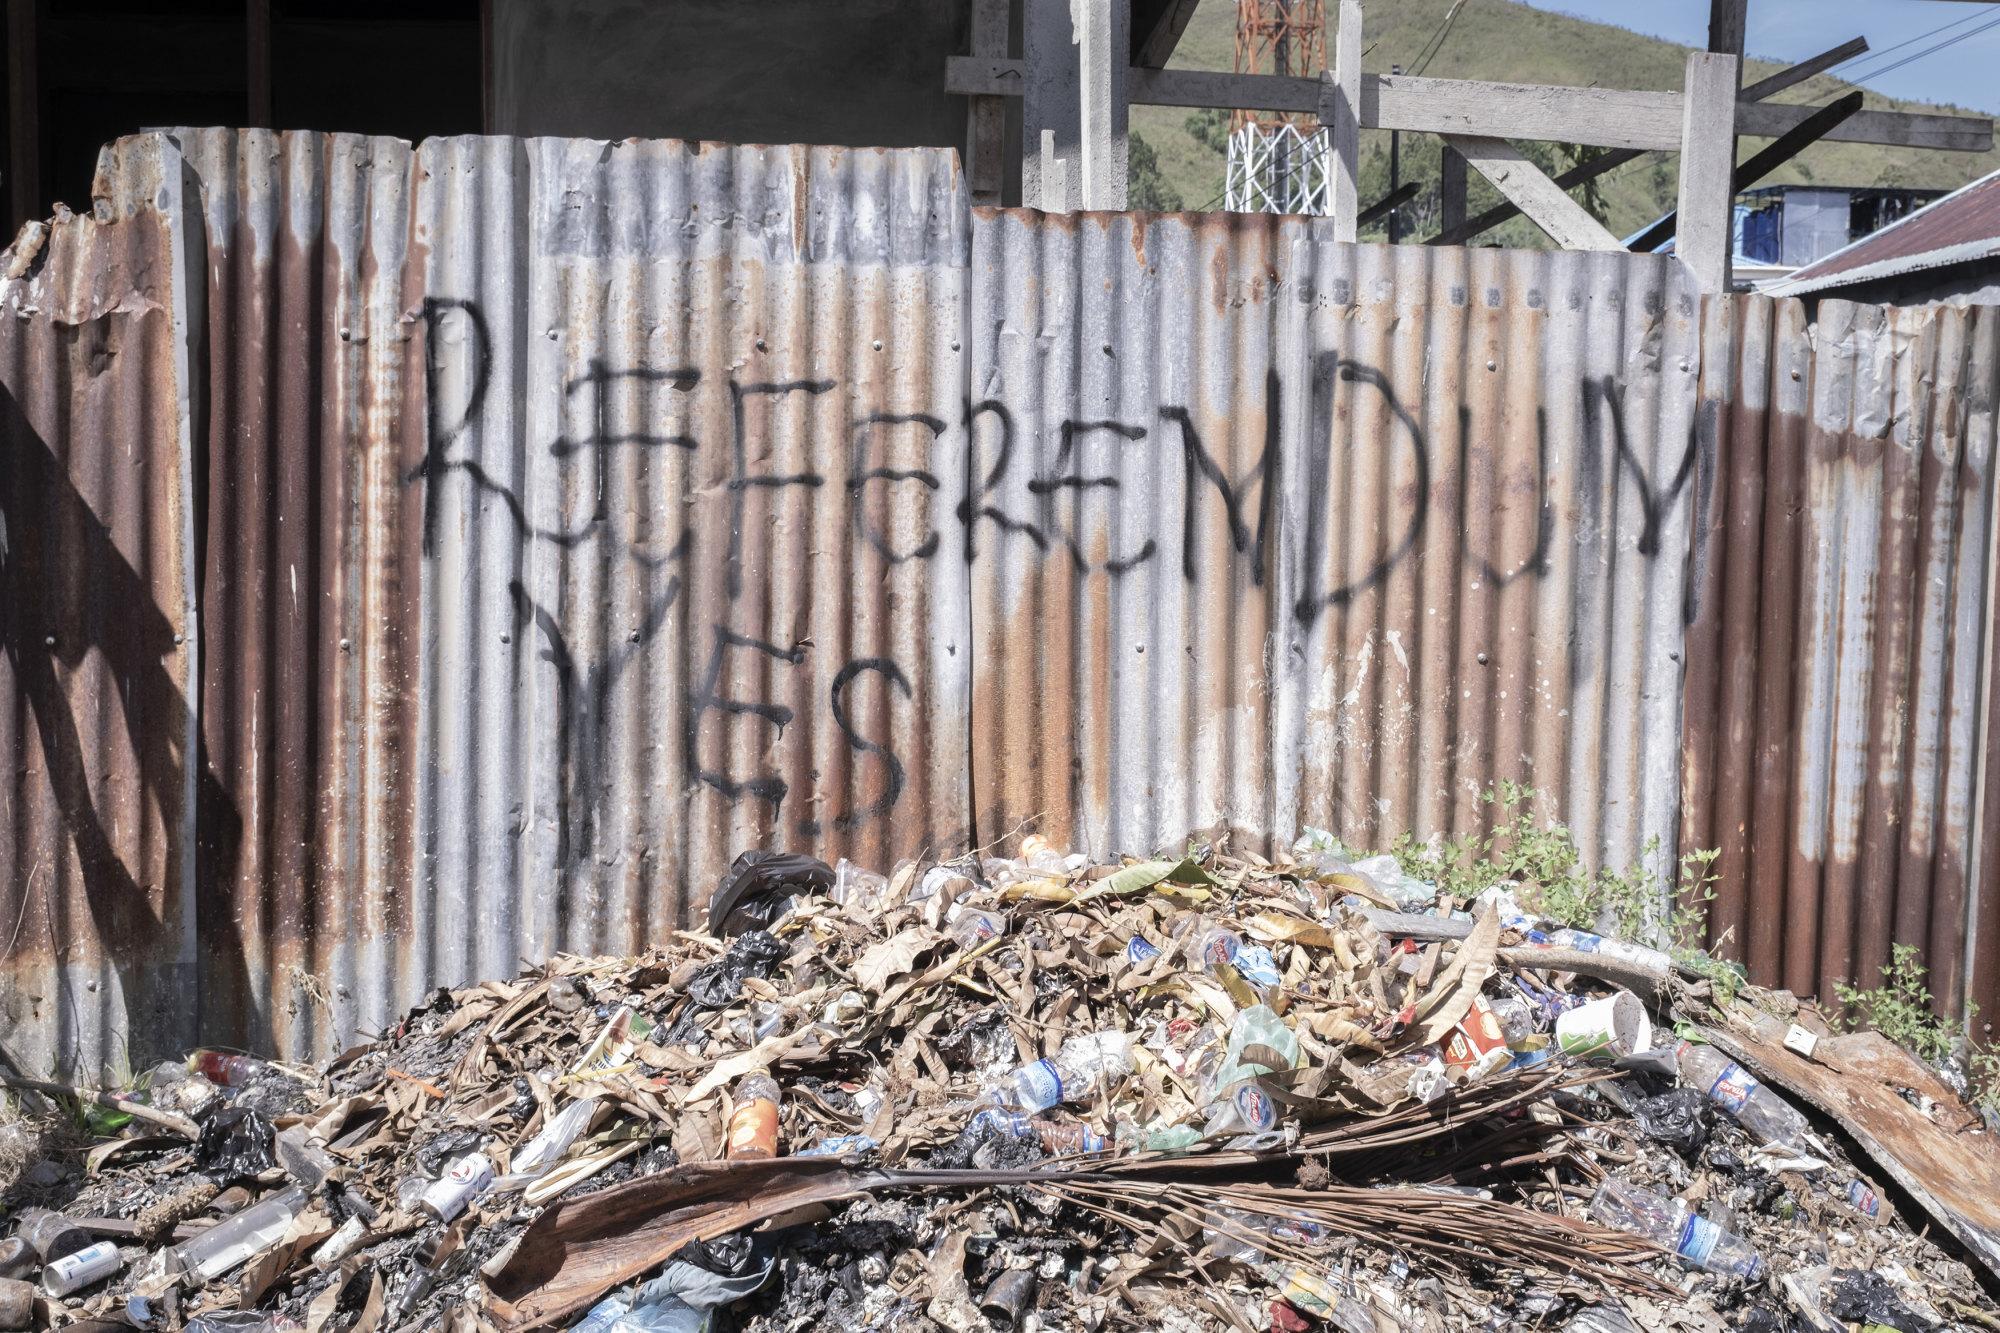 Graffiti calling for a referendum on Papuan self-rule in a residential area in Waena, Jayapura, Papua. Photo: Albertus Vembrianto